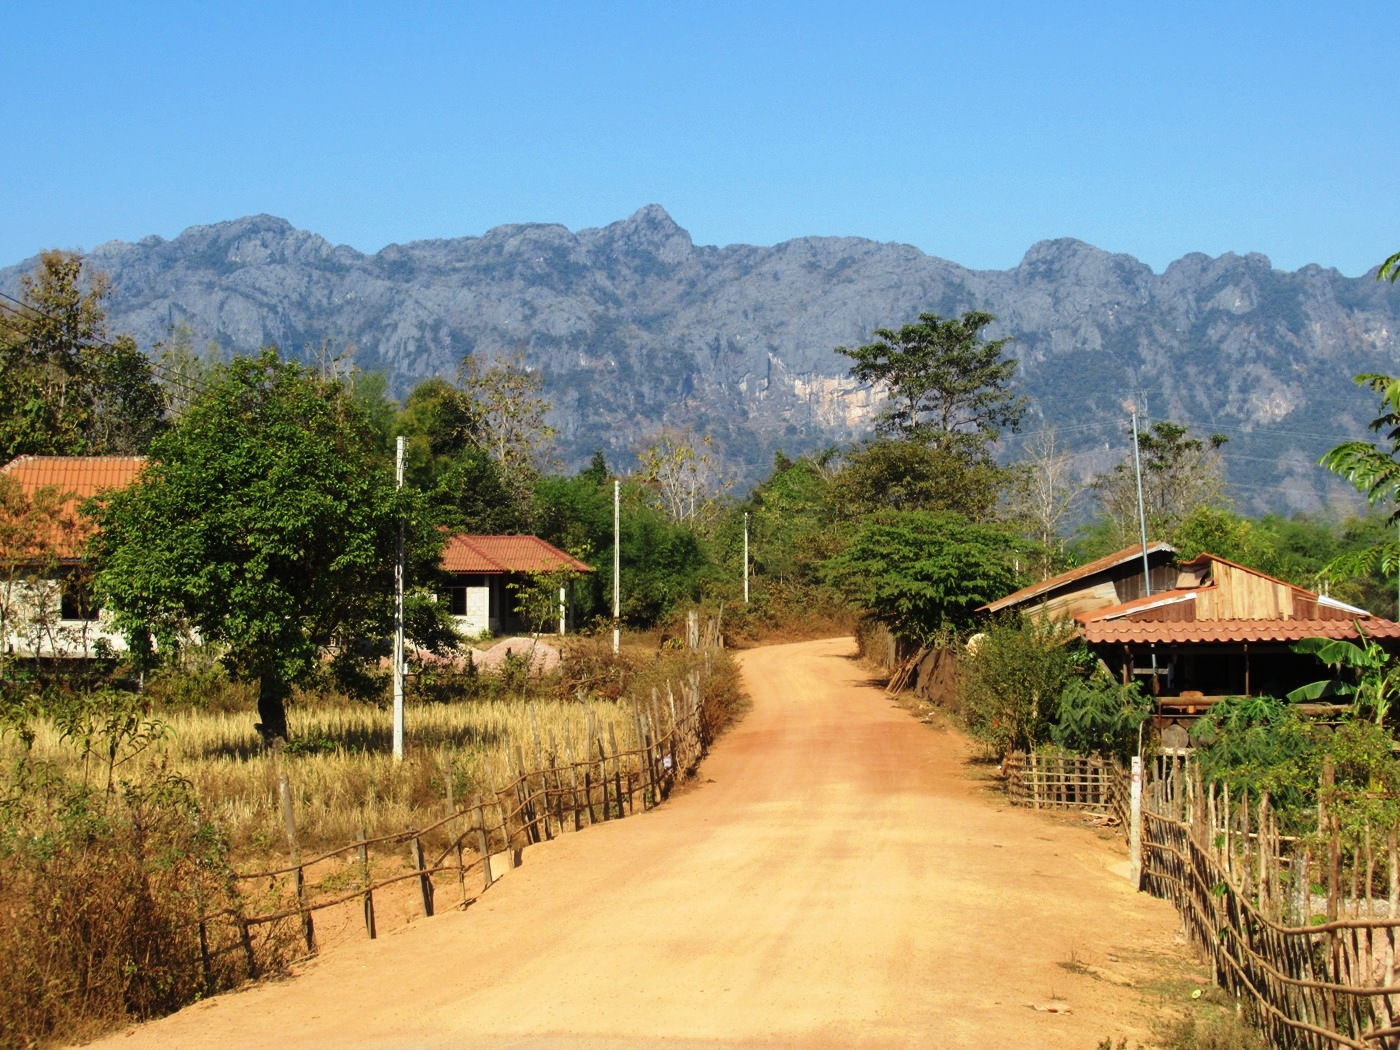 2019-12-laos-thakhek-loop-dia-2-19-carretera